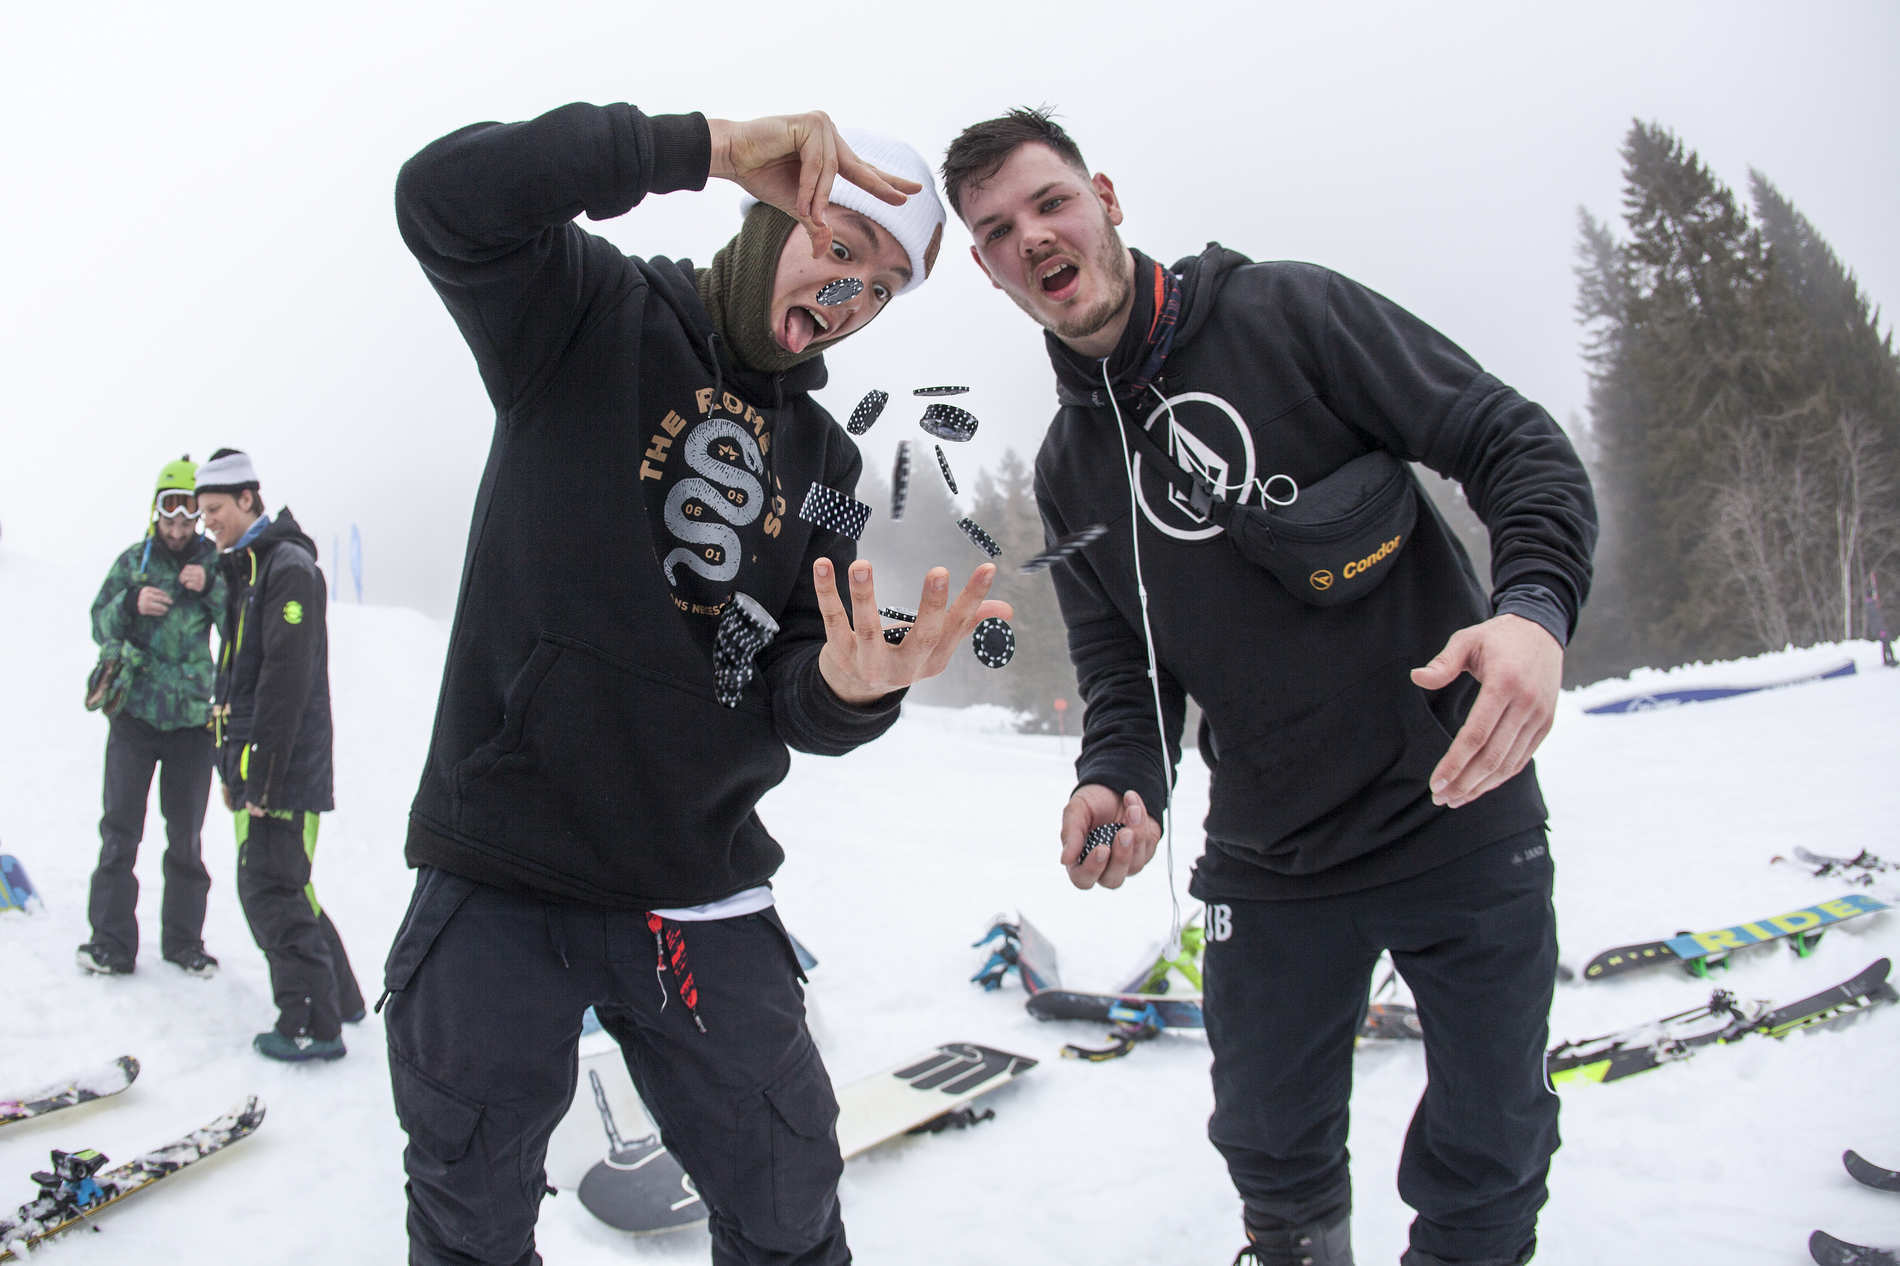 web snowpark feldberg 17 03 2018 lifestyle fs sb martin herrmann qparks 46